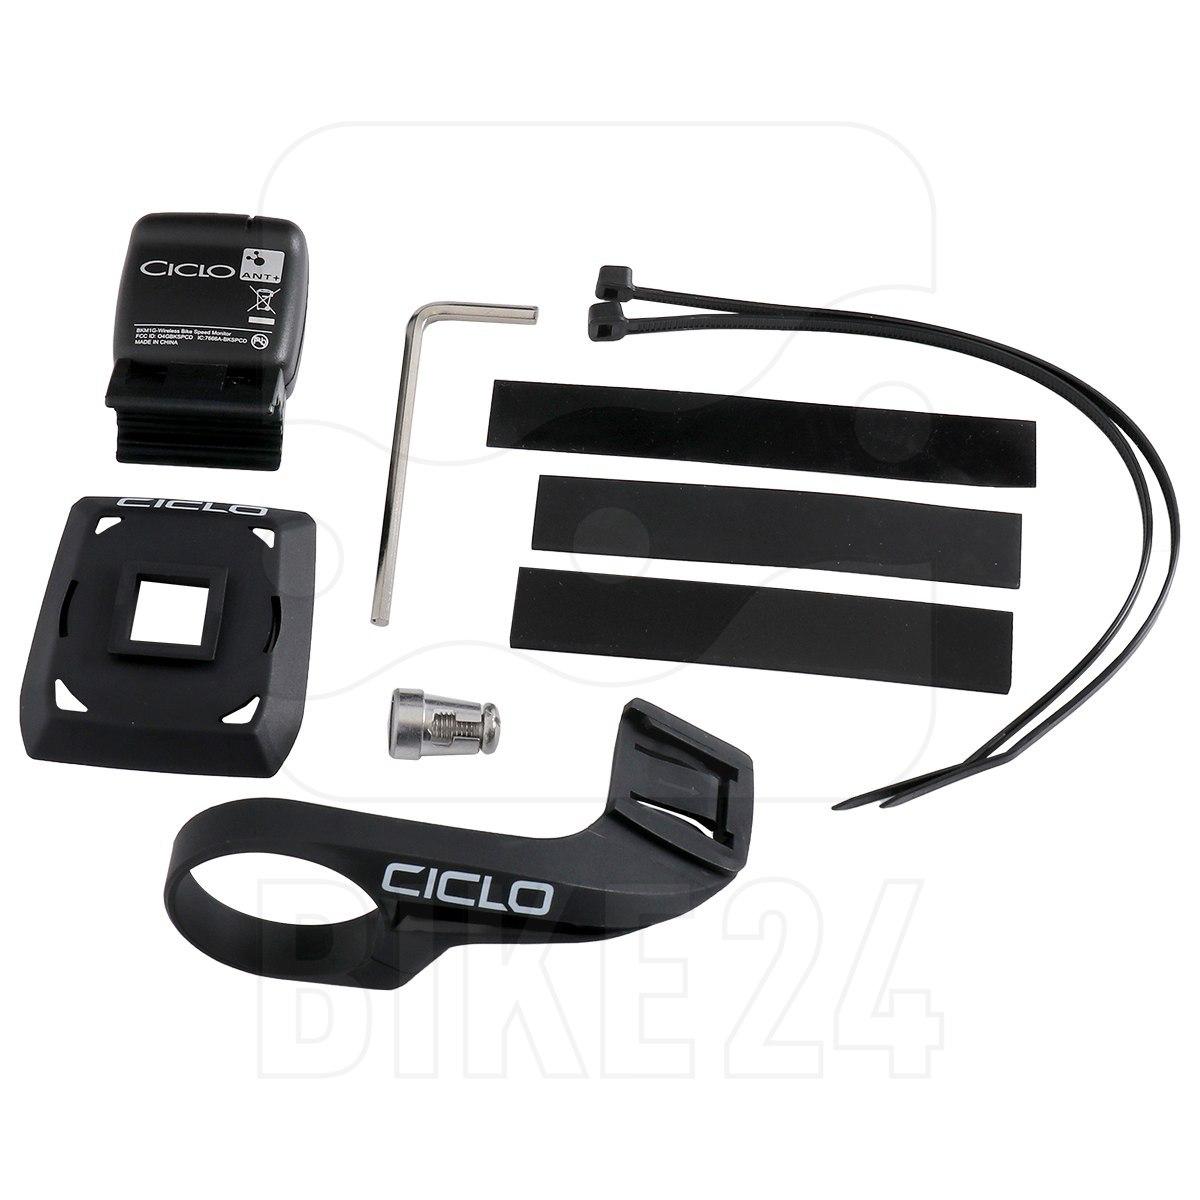 Ciclosport QMS Handlebar bracket / Speed sensor Set for HAC 1.x 11302401